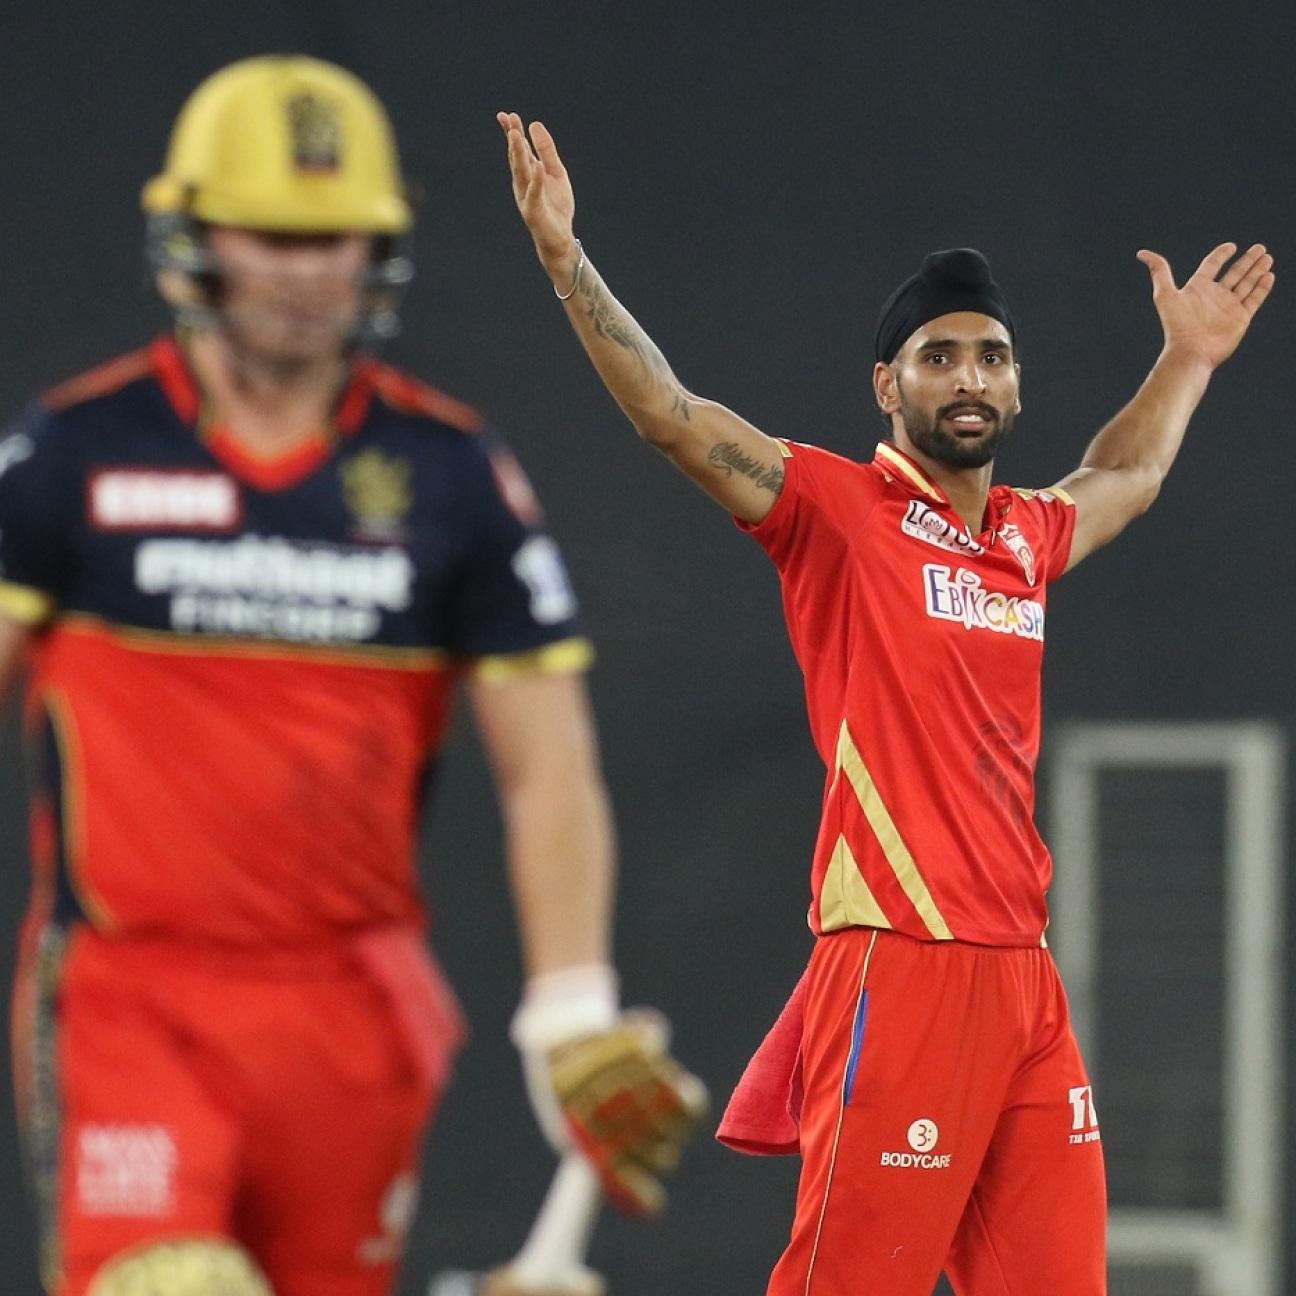 Punjab Kings beat RCB Punjab Kings won by 34 runs - Punjab Kings vs RCB, IPL, 26th Match Match Summary, Report | ESPNcricinfo.com